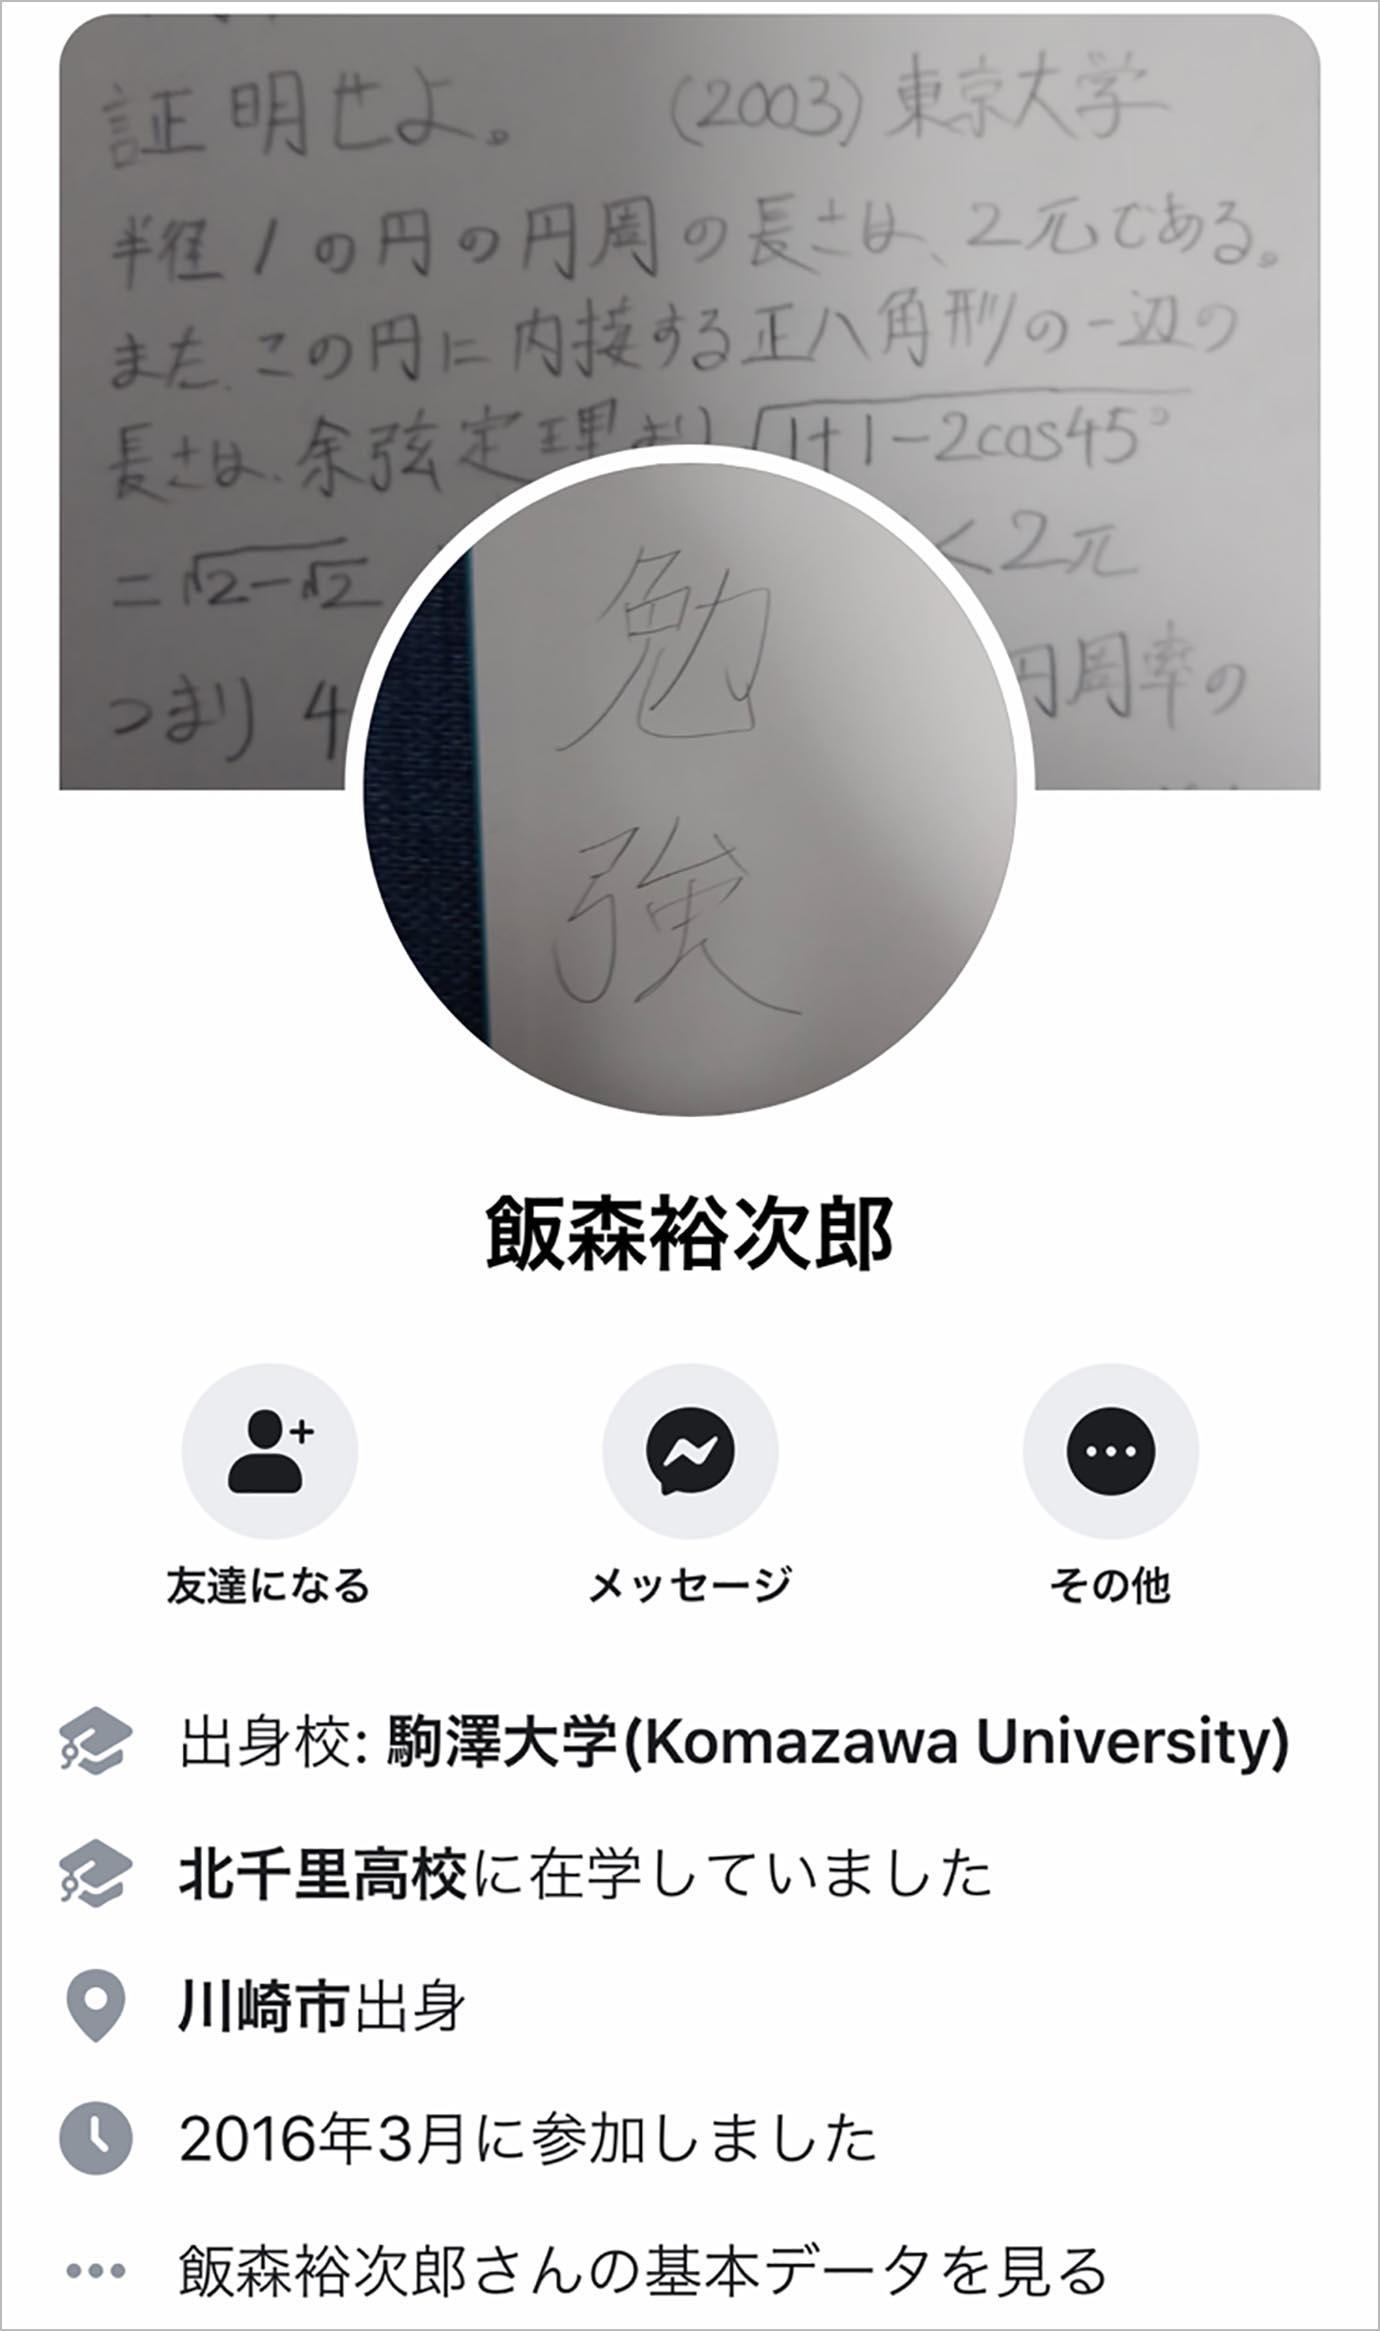 iimori-yujiro9